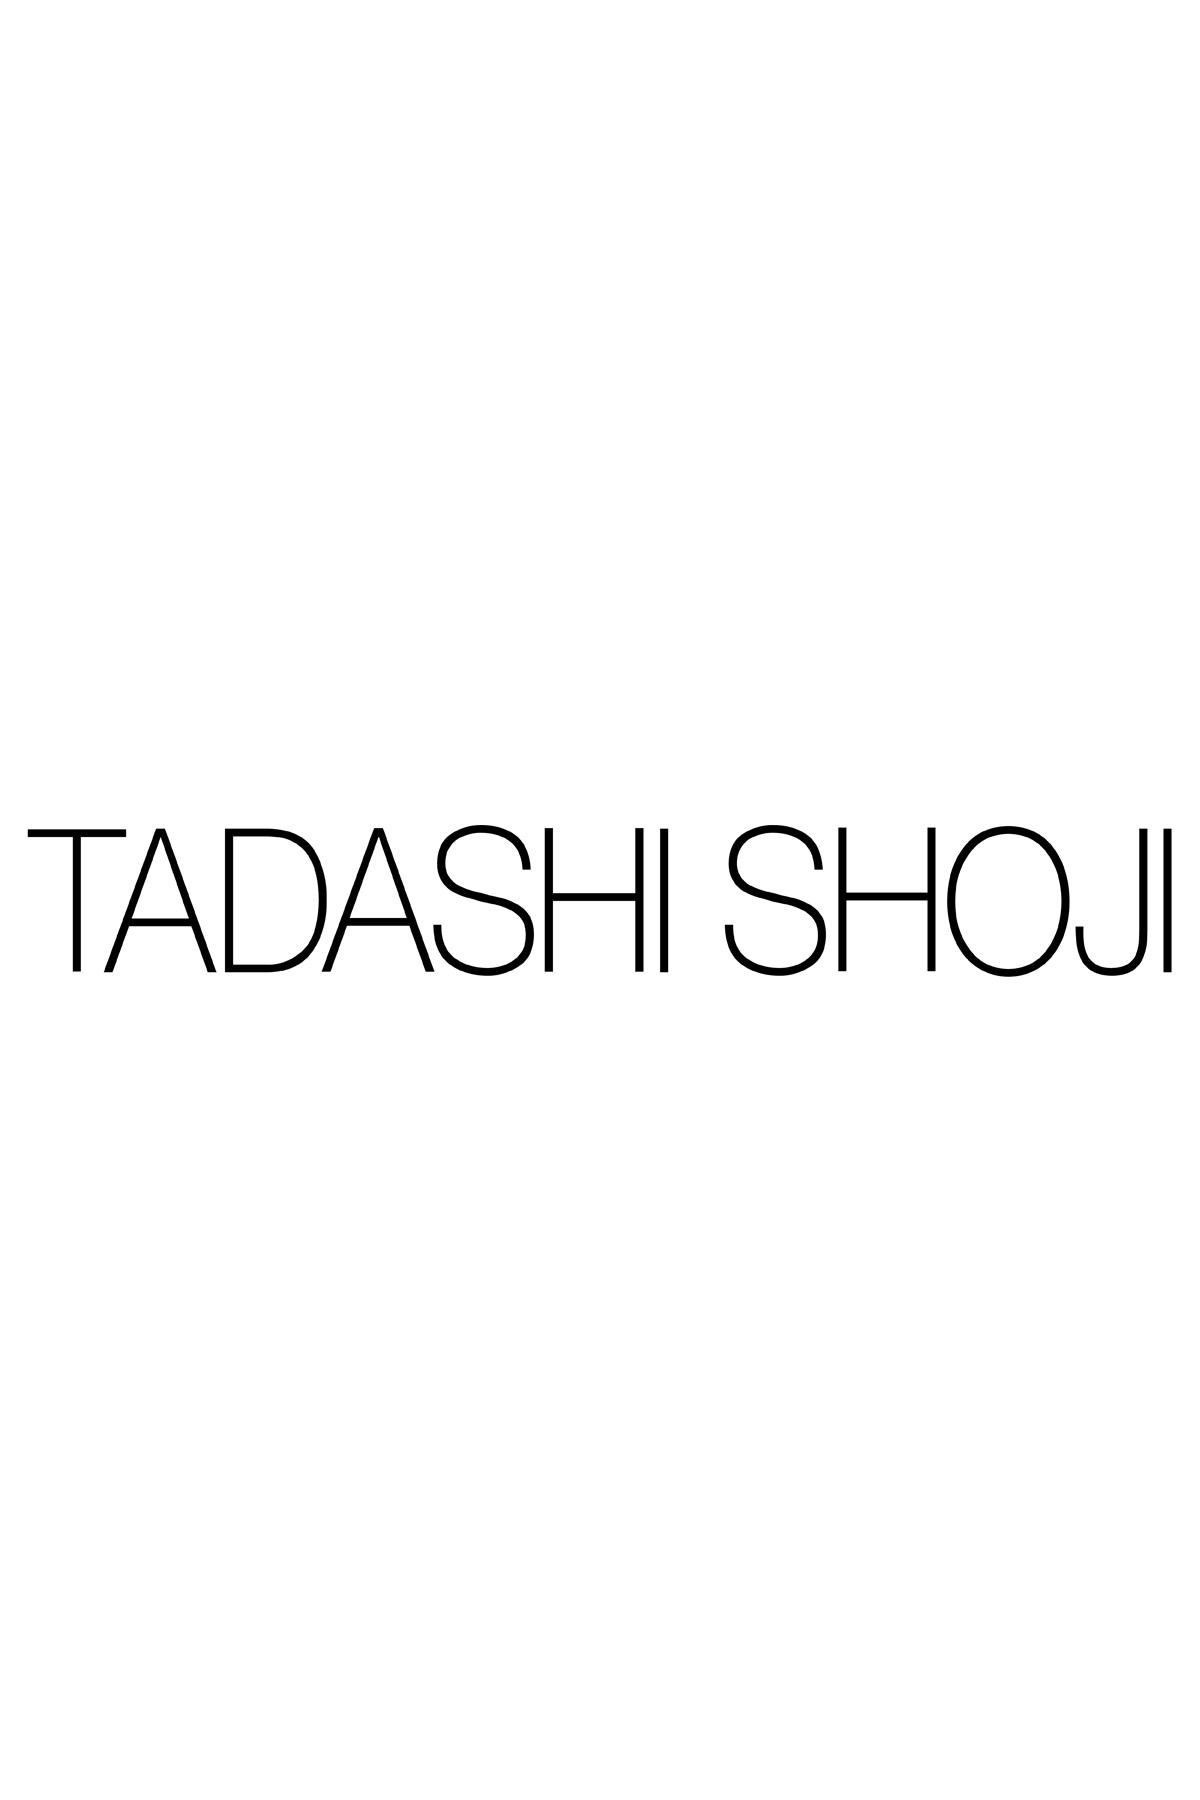 Tadashi Shoji -Vibiana Embroidered Sequin Gown - PLUS SIZE